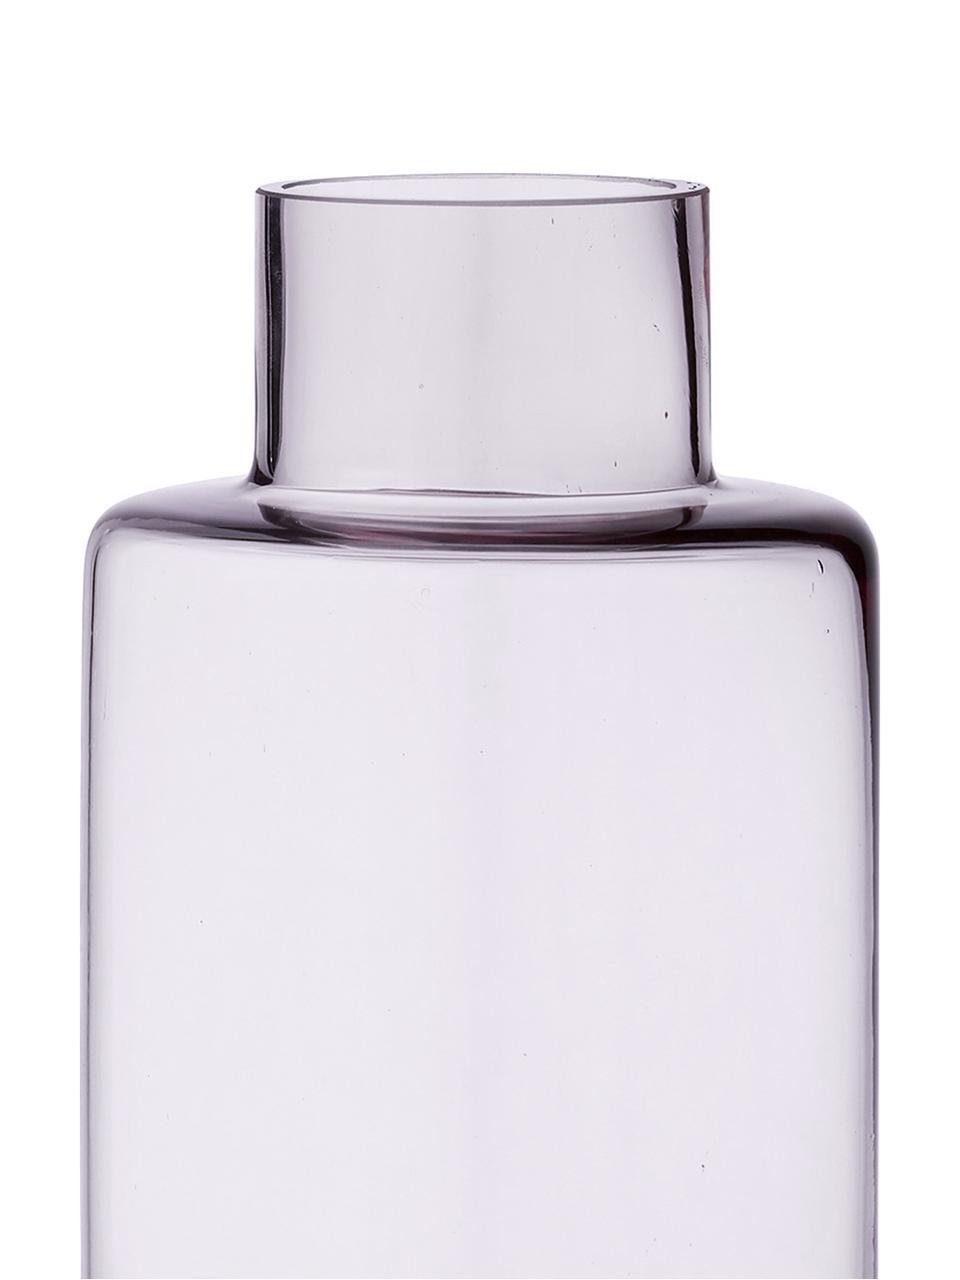 Grote mondgeblazen vaas Hedria, Glas, Roze, Ø 11 x H 30 cm